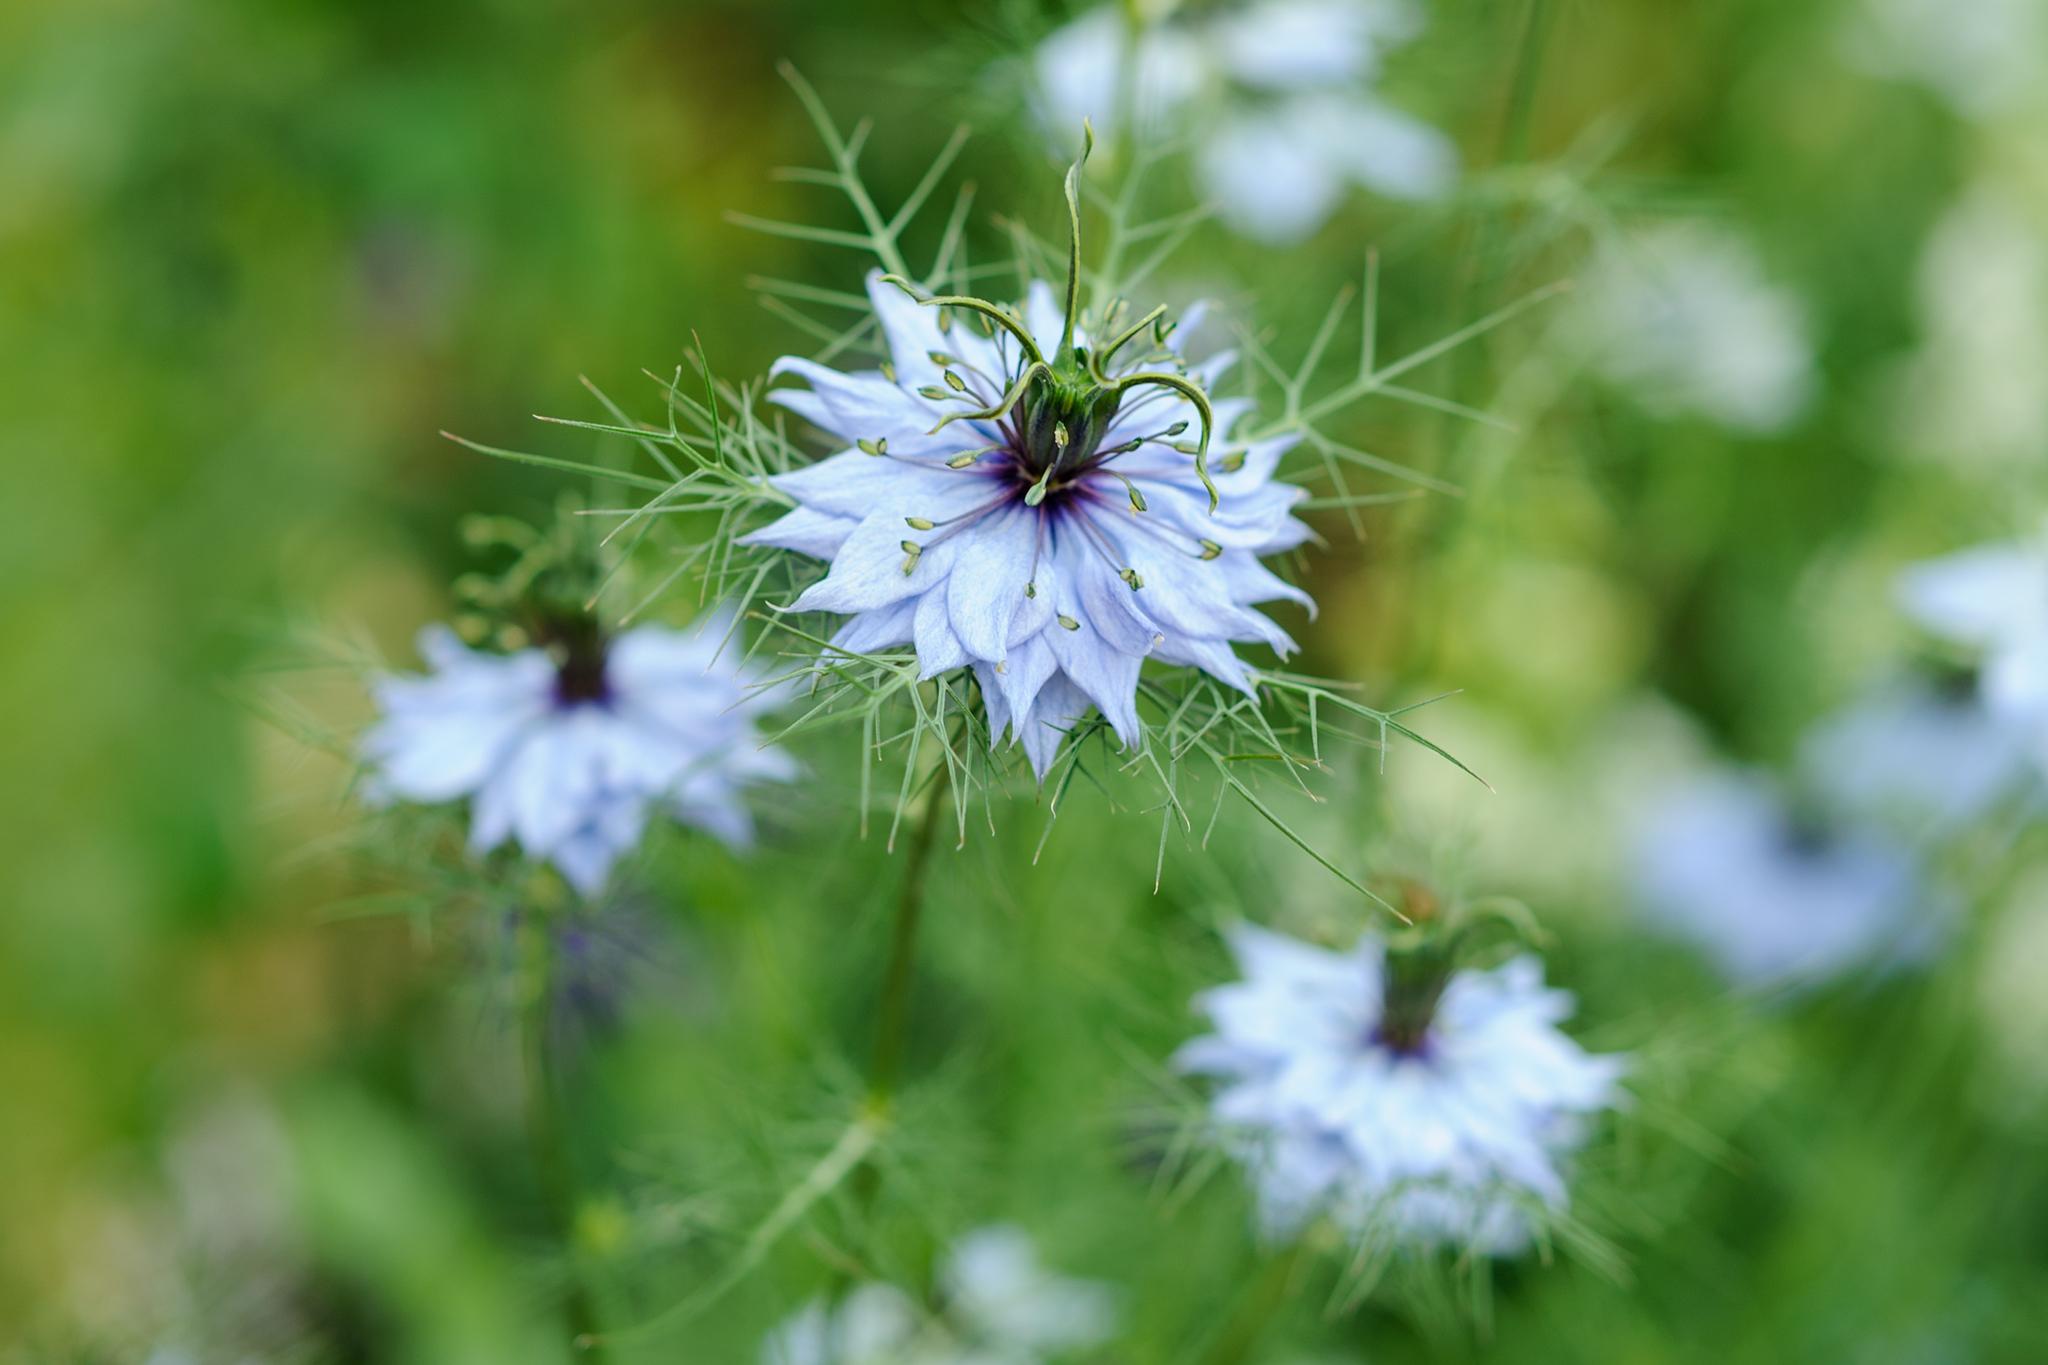 flowers-to-pick-in-august-nigella-damascena-2